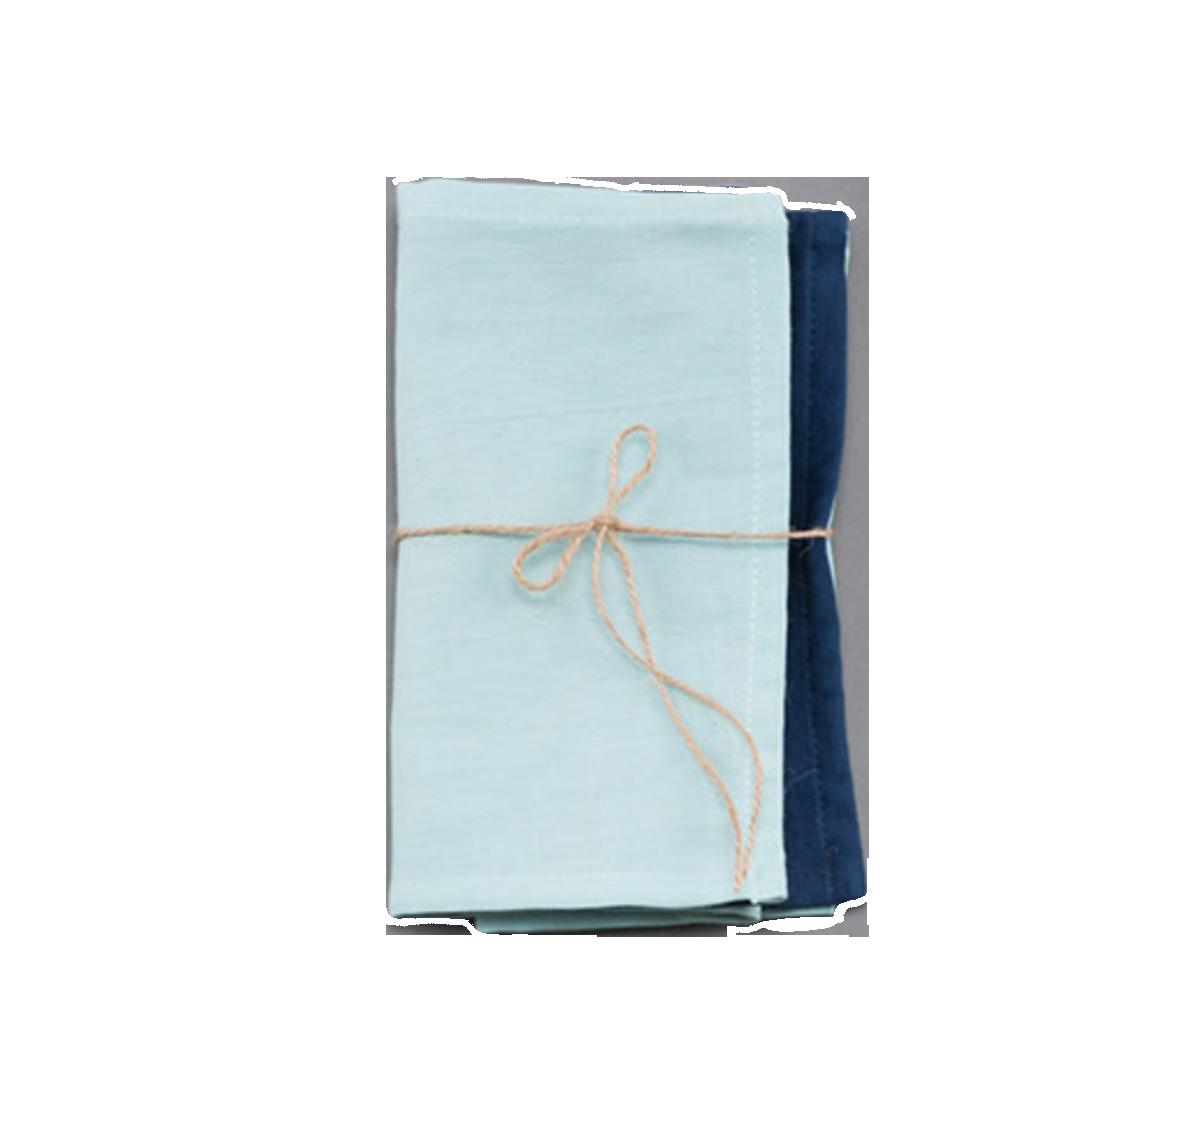 Basik Napkin [Aqua]